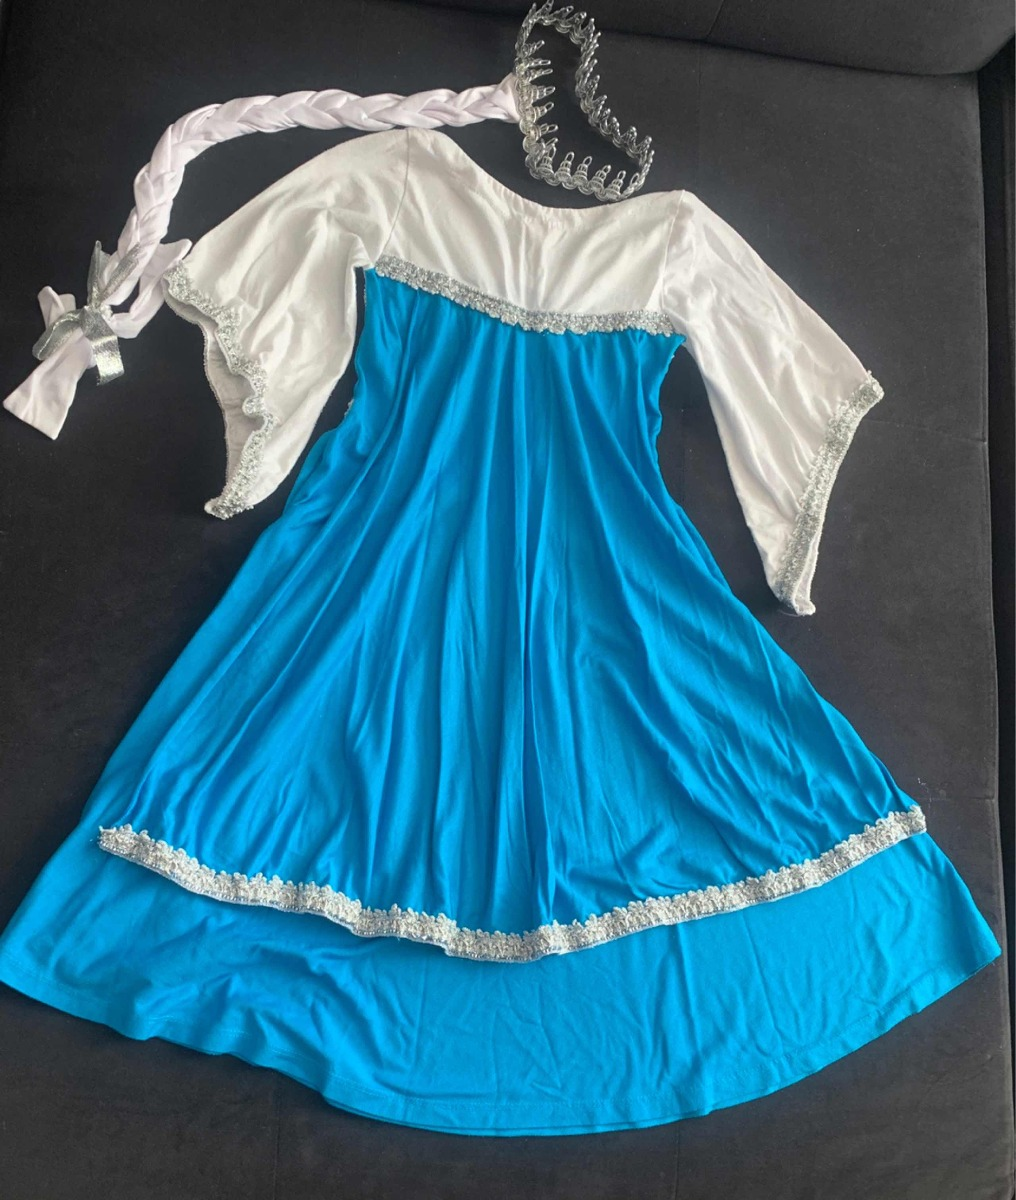 70cadd1b2 vestidos fantasia camisola elsa e anna frozen infantil. Carregando zoom.